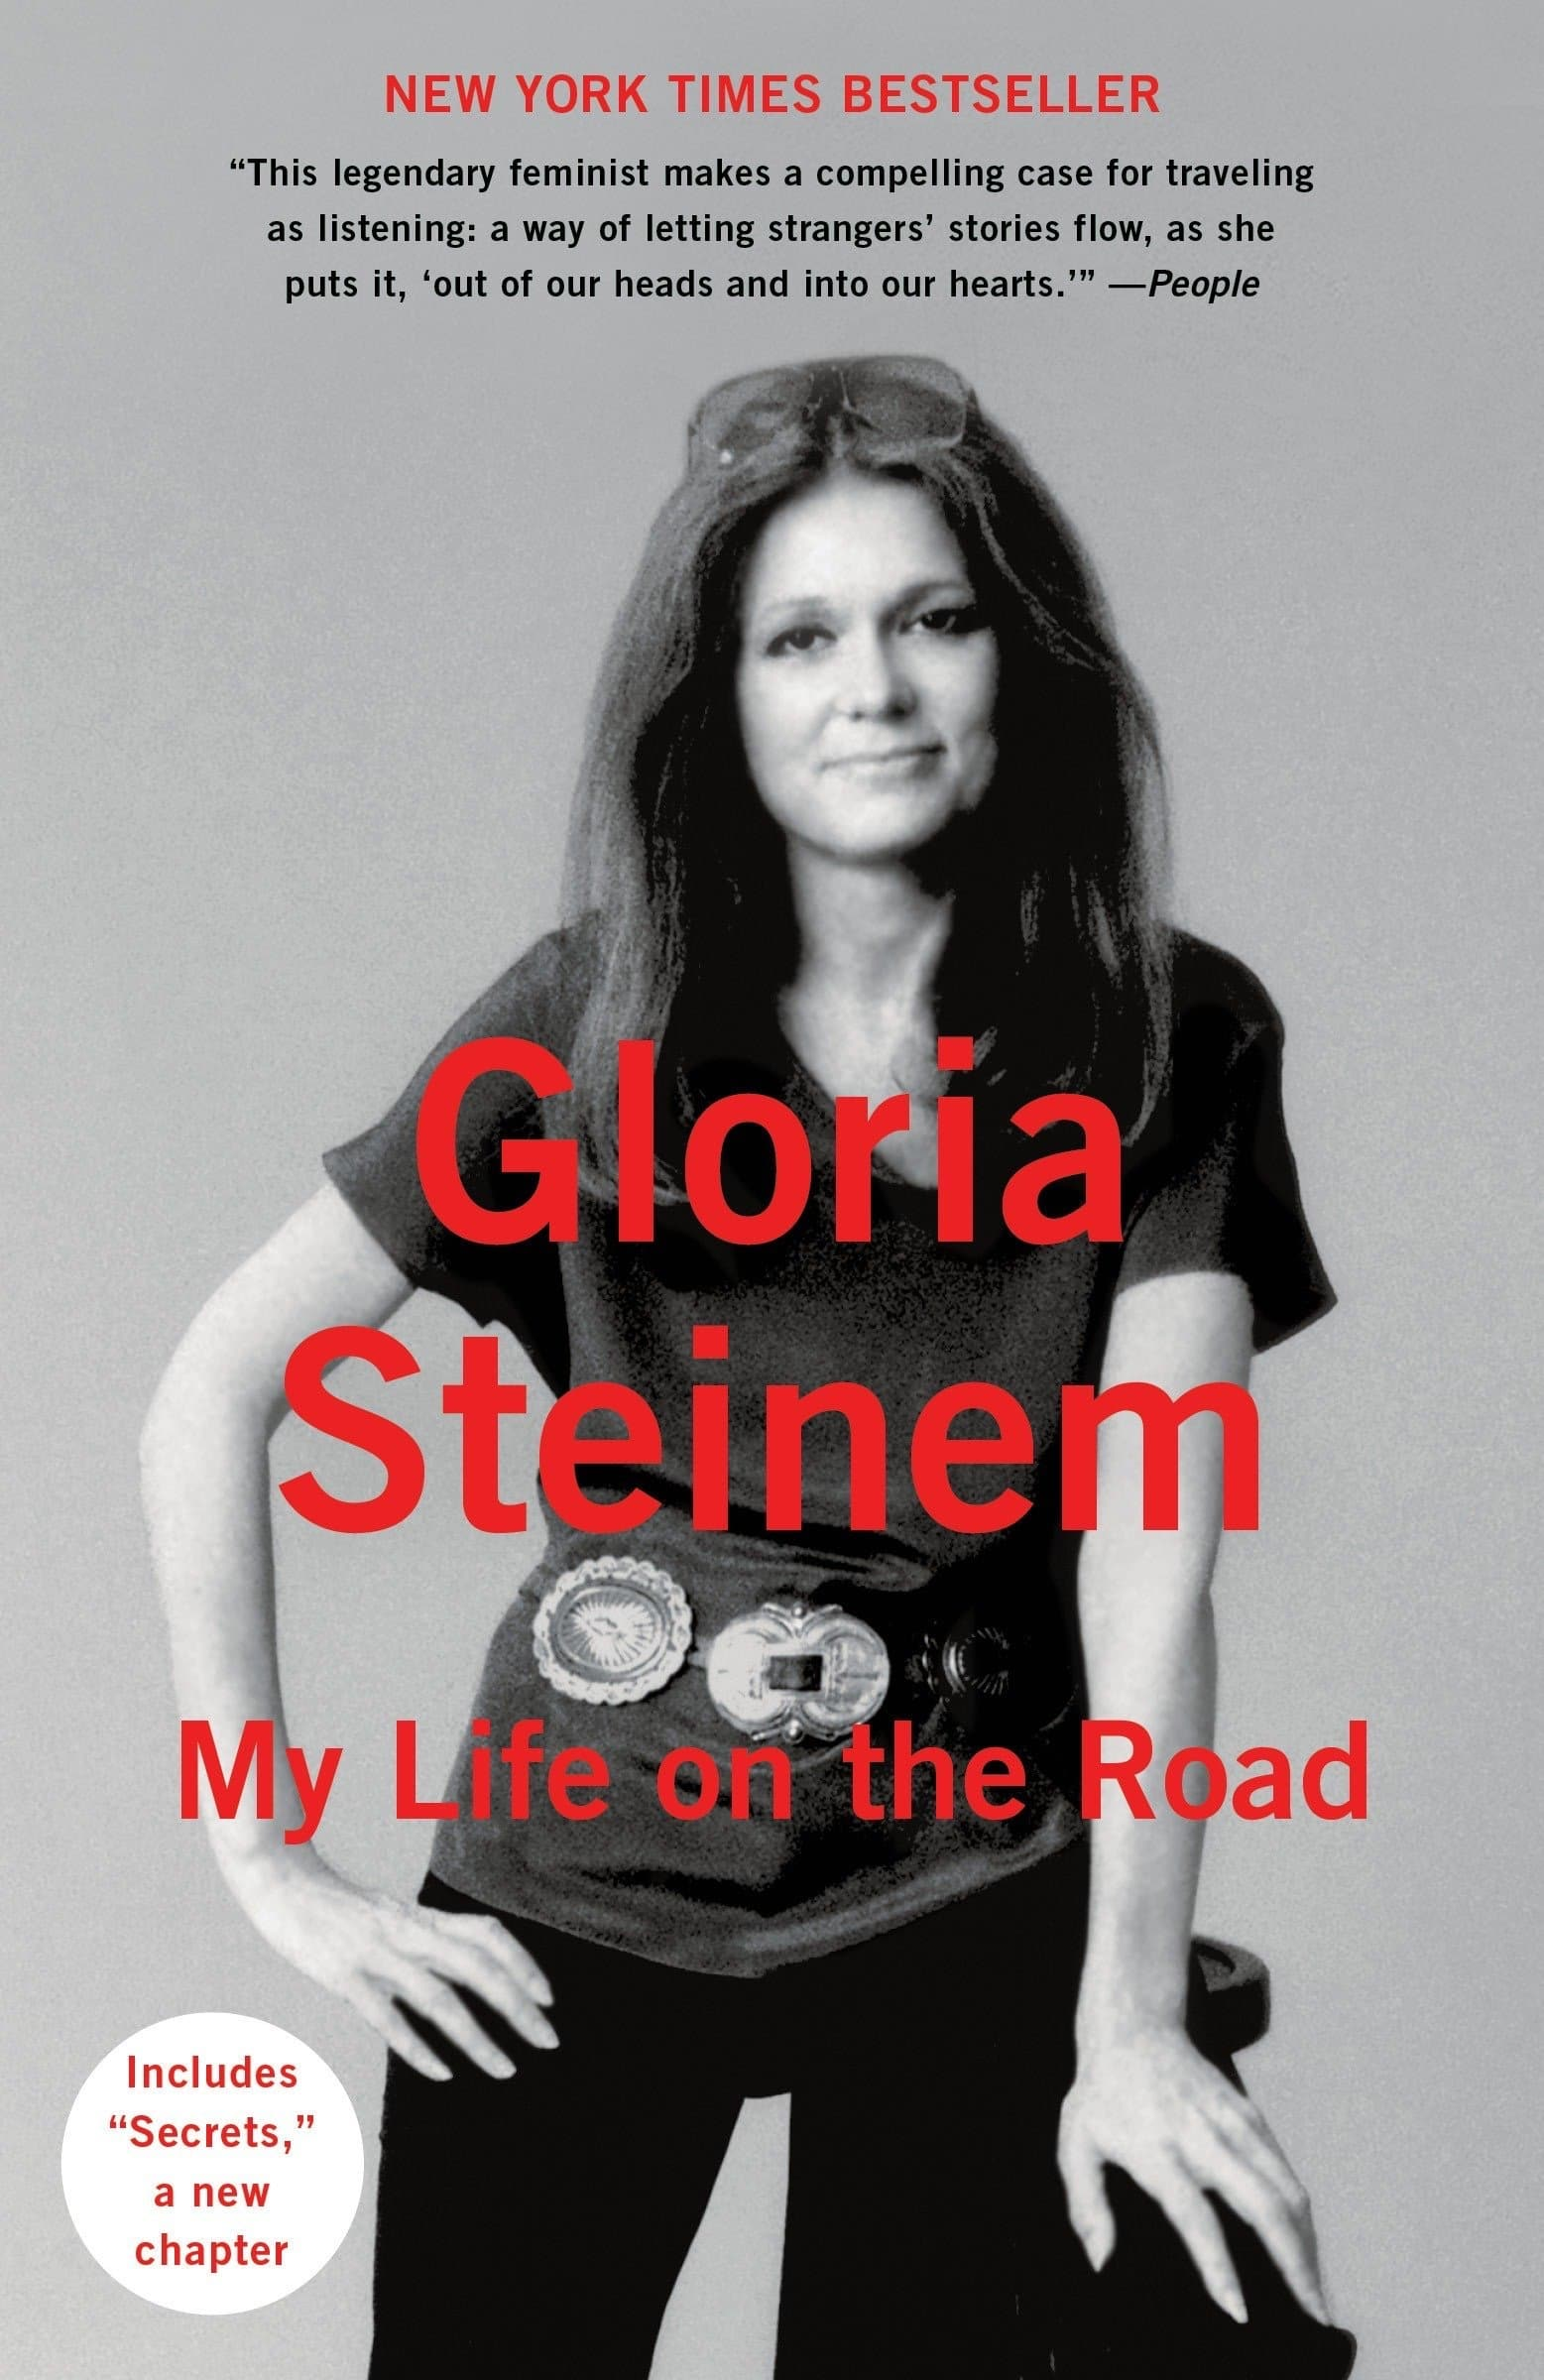 gloria steinem book